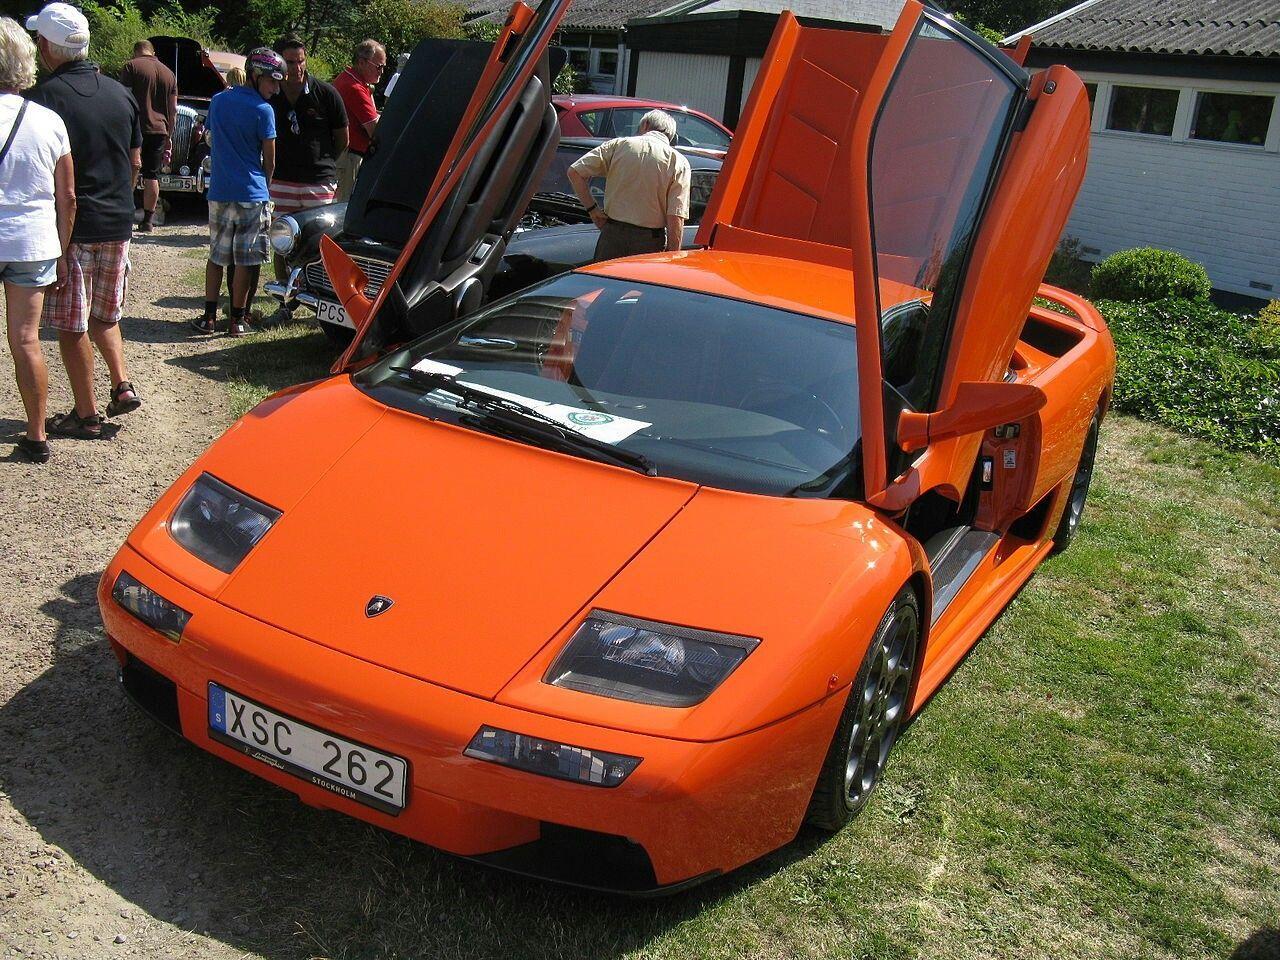 Charming Lamborghini Diablo VT Spider | Lamborghini | Pinterest | Lamborghini Diablo  And Lamborghini